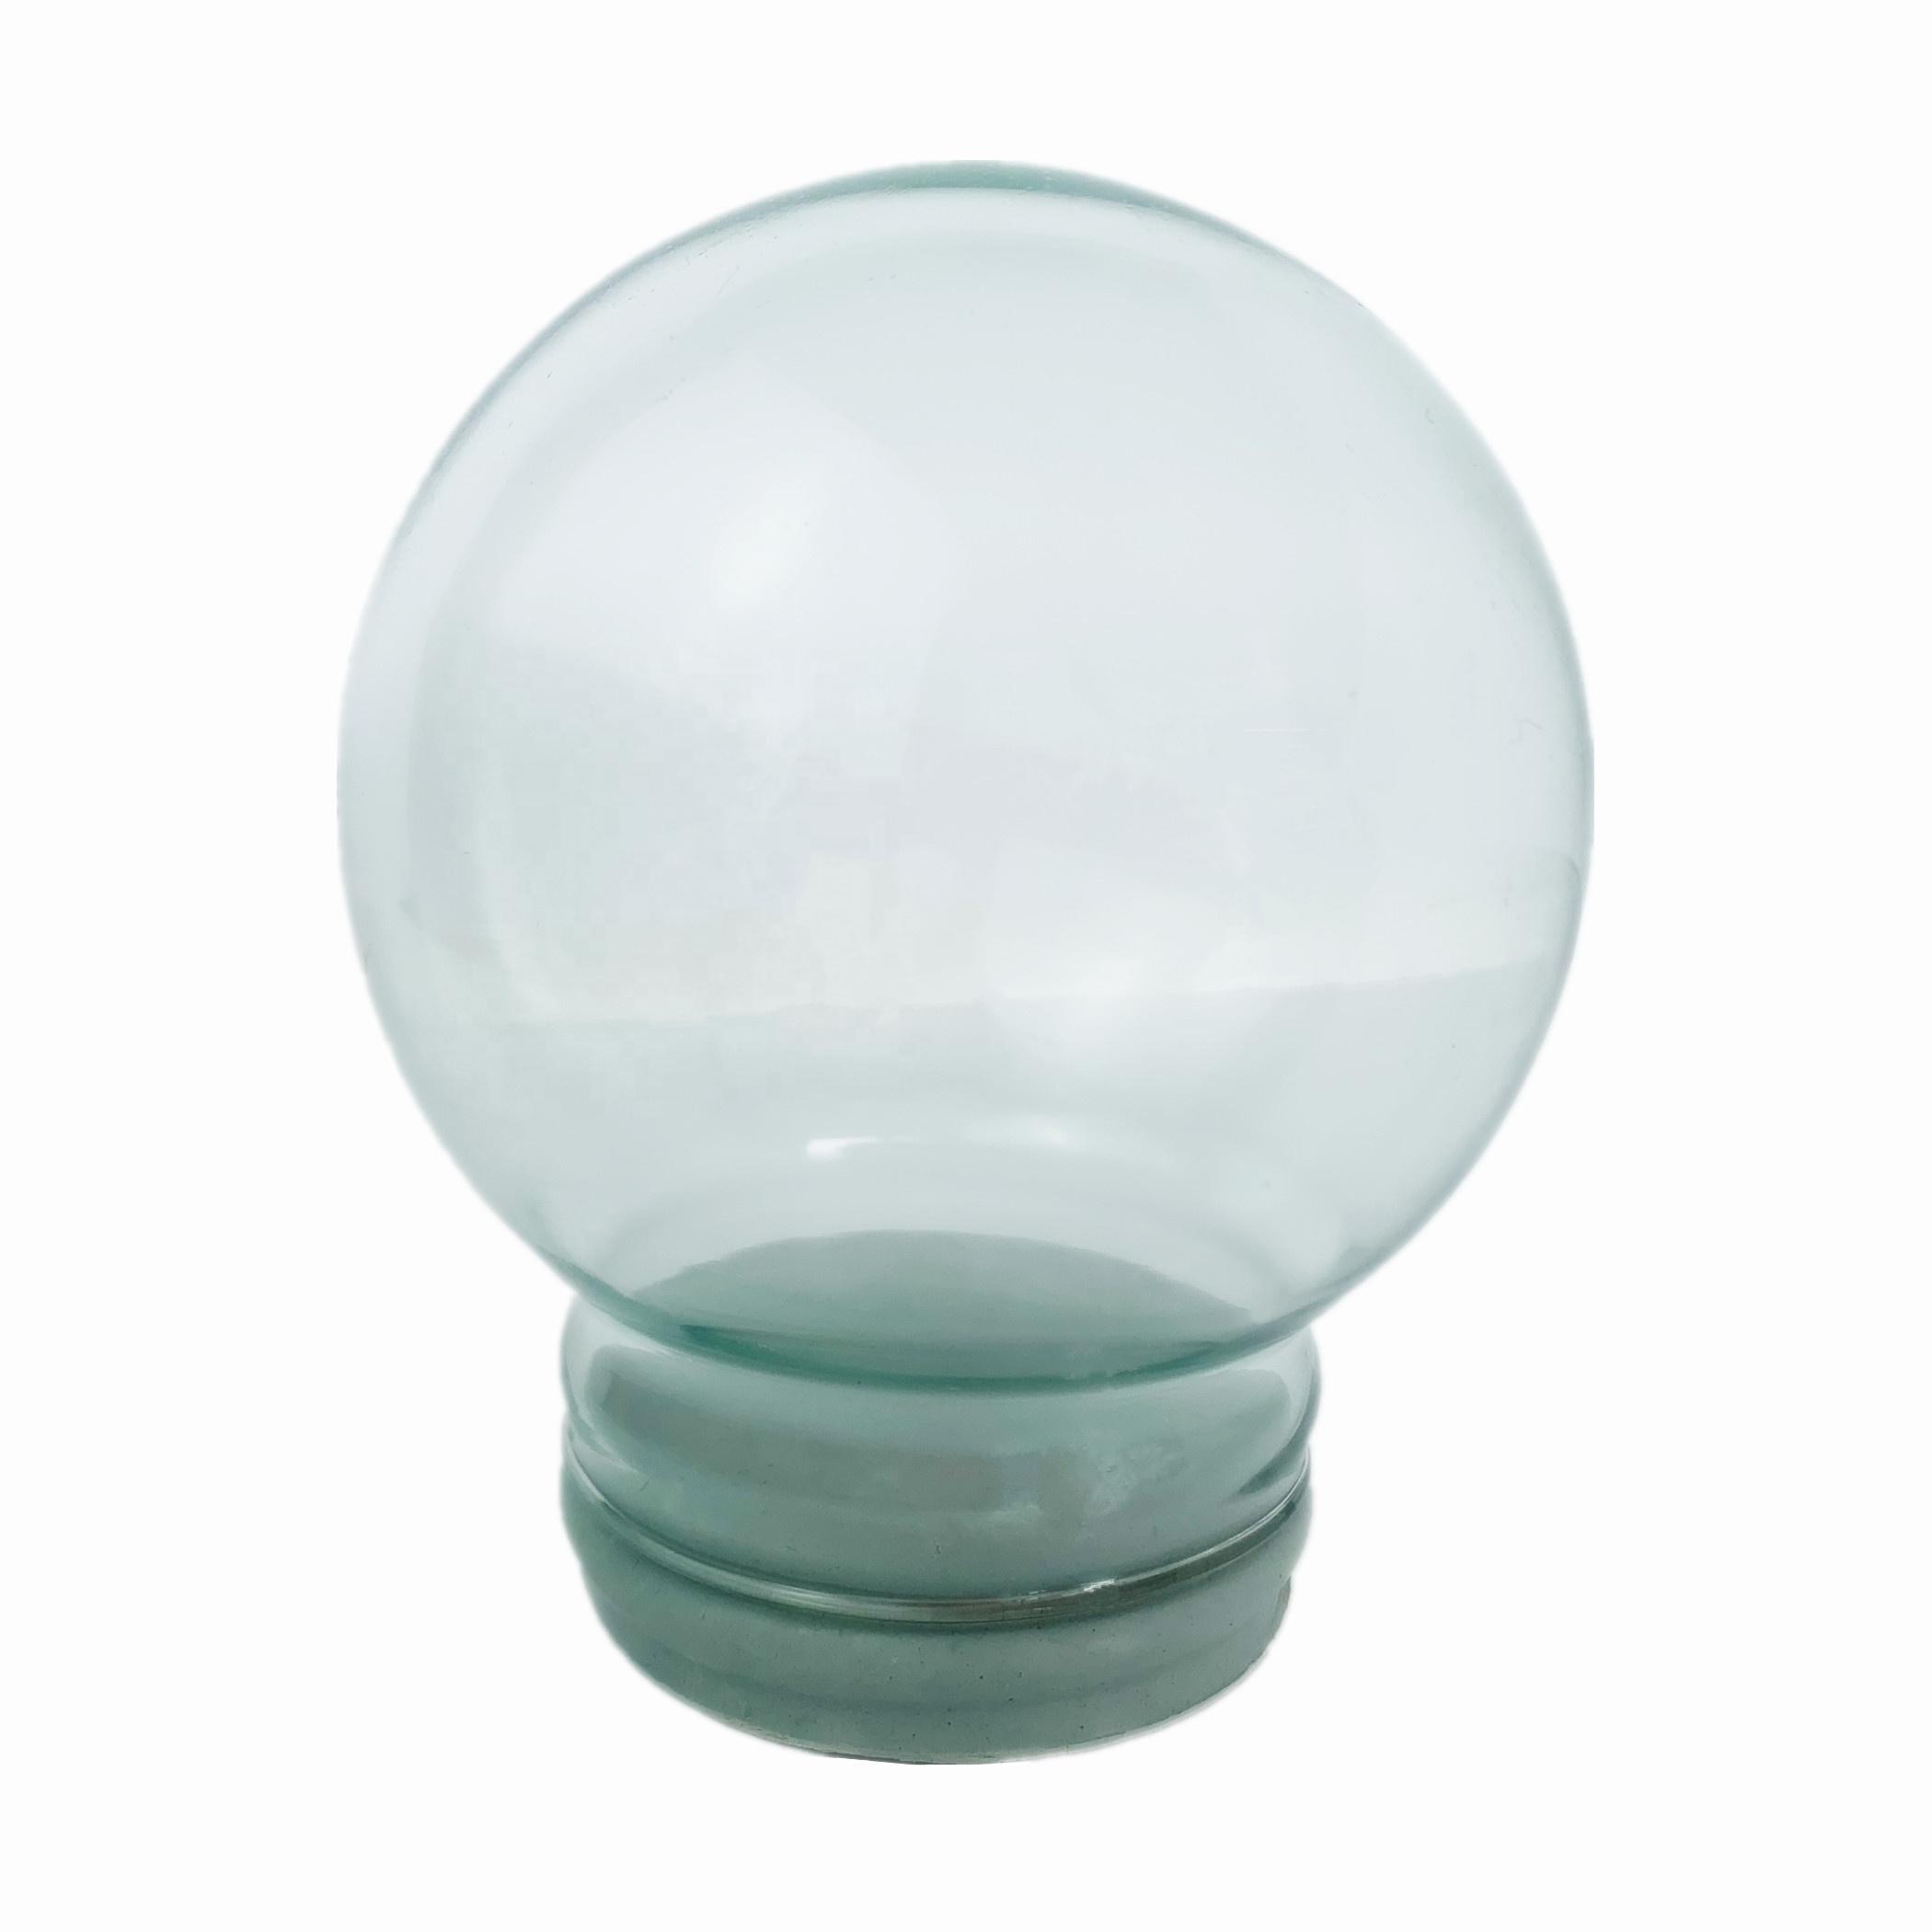 DIY Empty glass snow globe with 120mm diameter / Wholesales empty water snow globe for decoration